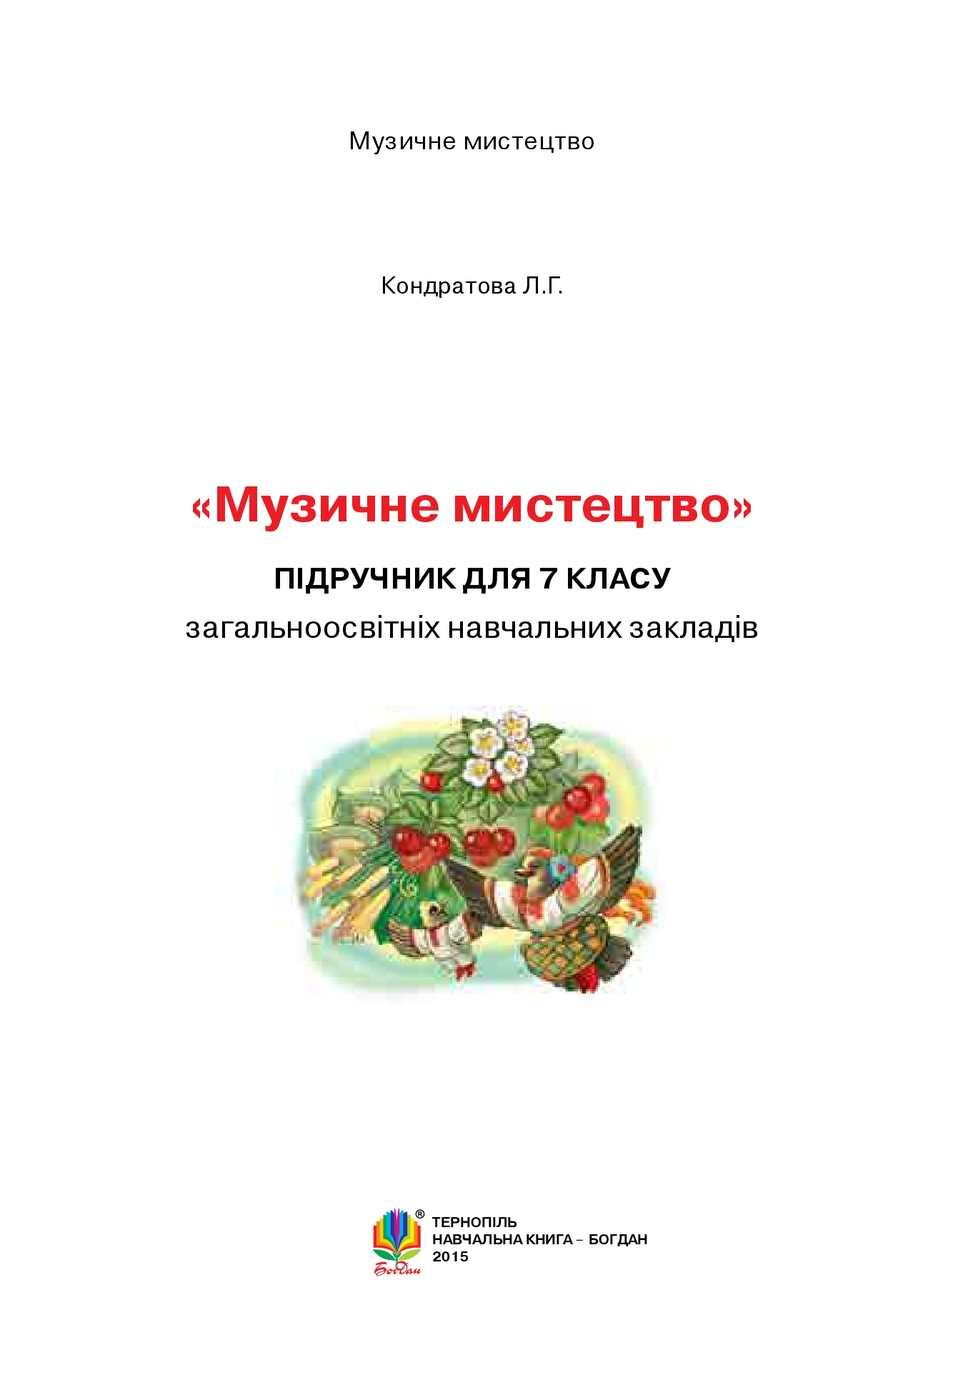 Calaméo - 7 Klas Muzichne Mistectvo Kondratova 2015 20facdf471ee7